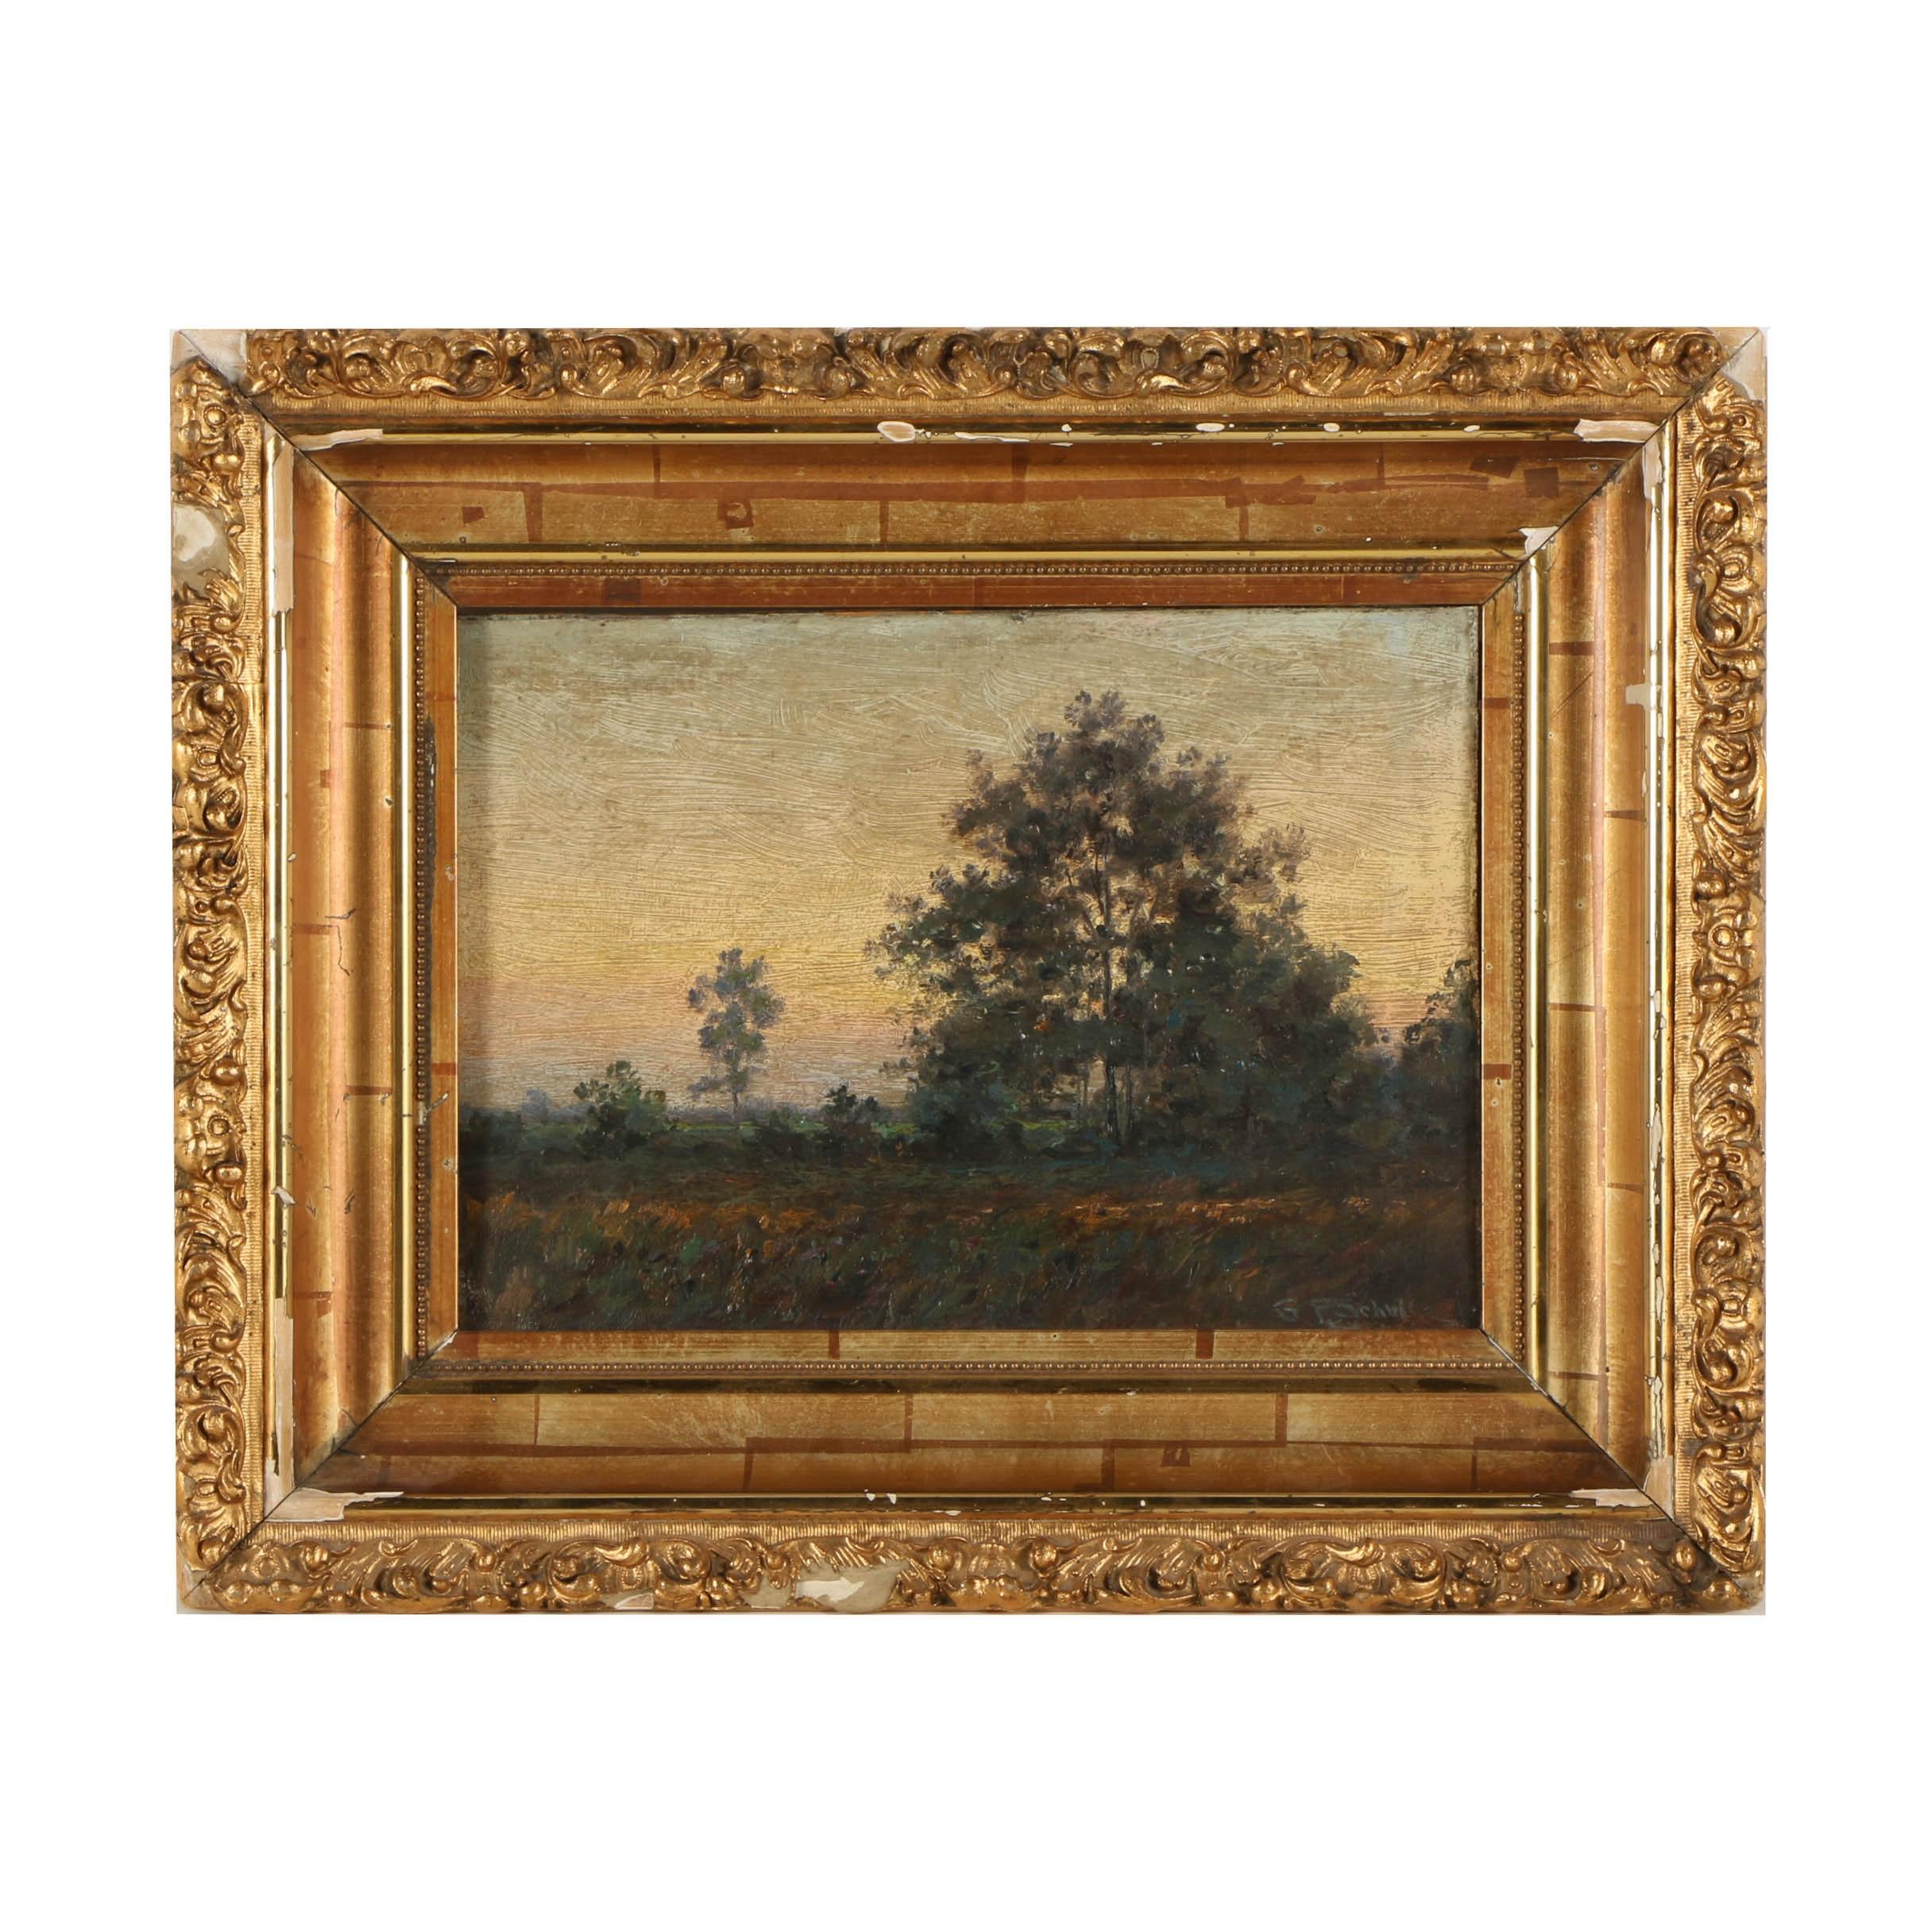 George Shultz Oil Tonalist Landscape Painting on Board